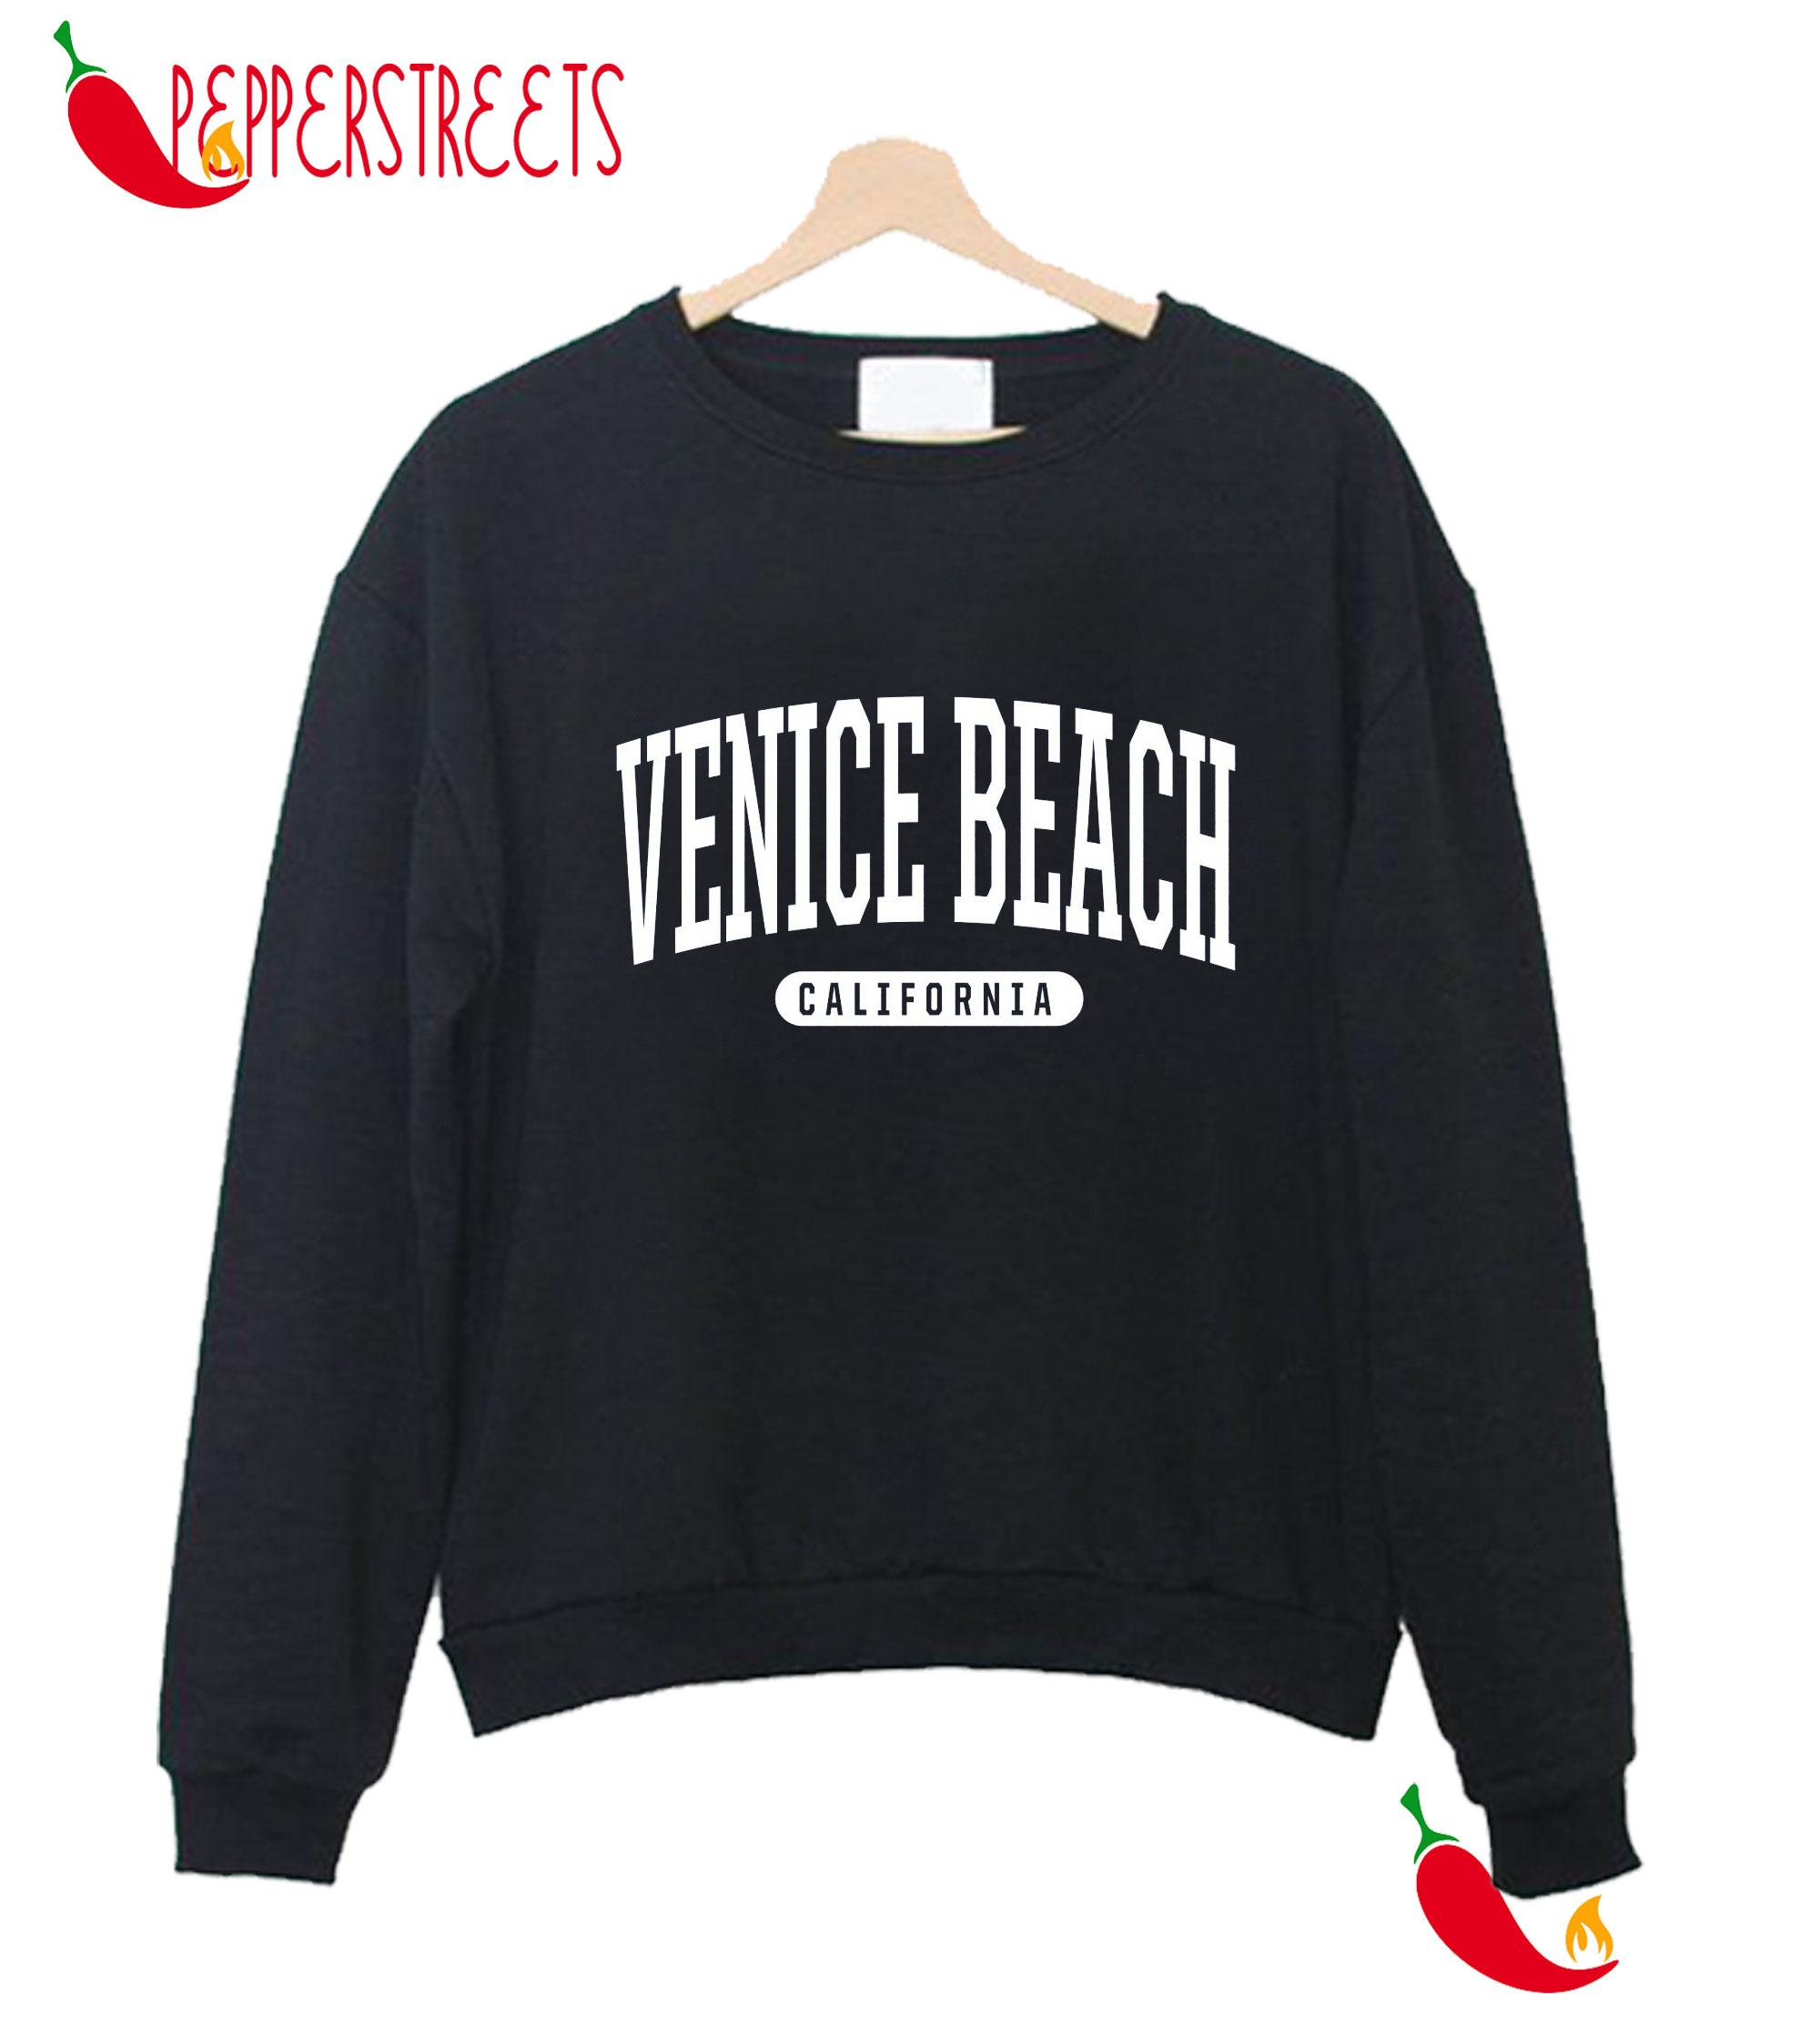 Venice Beach California Sweatshirt